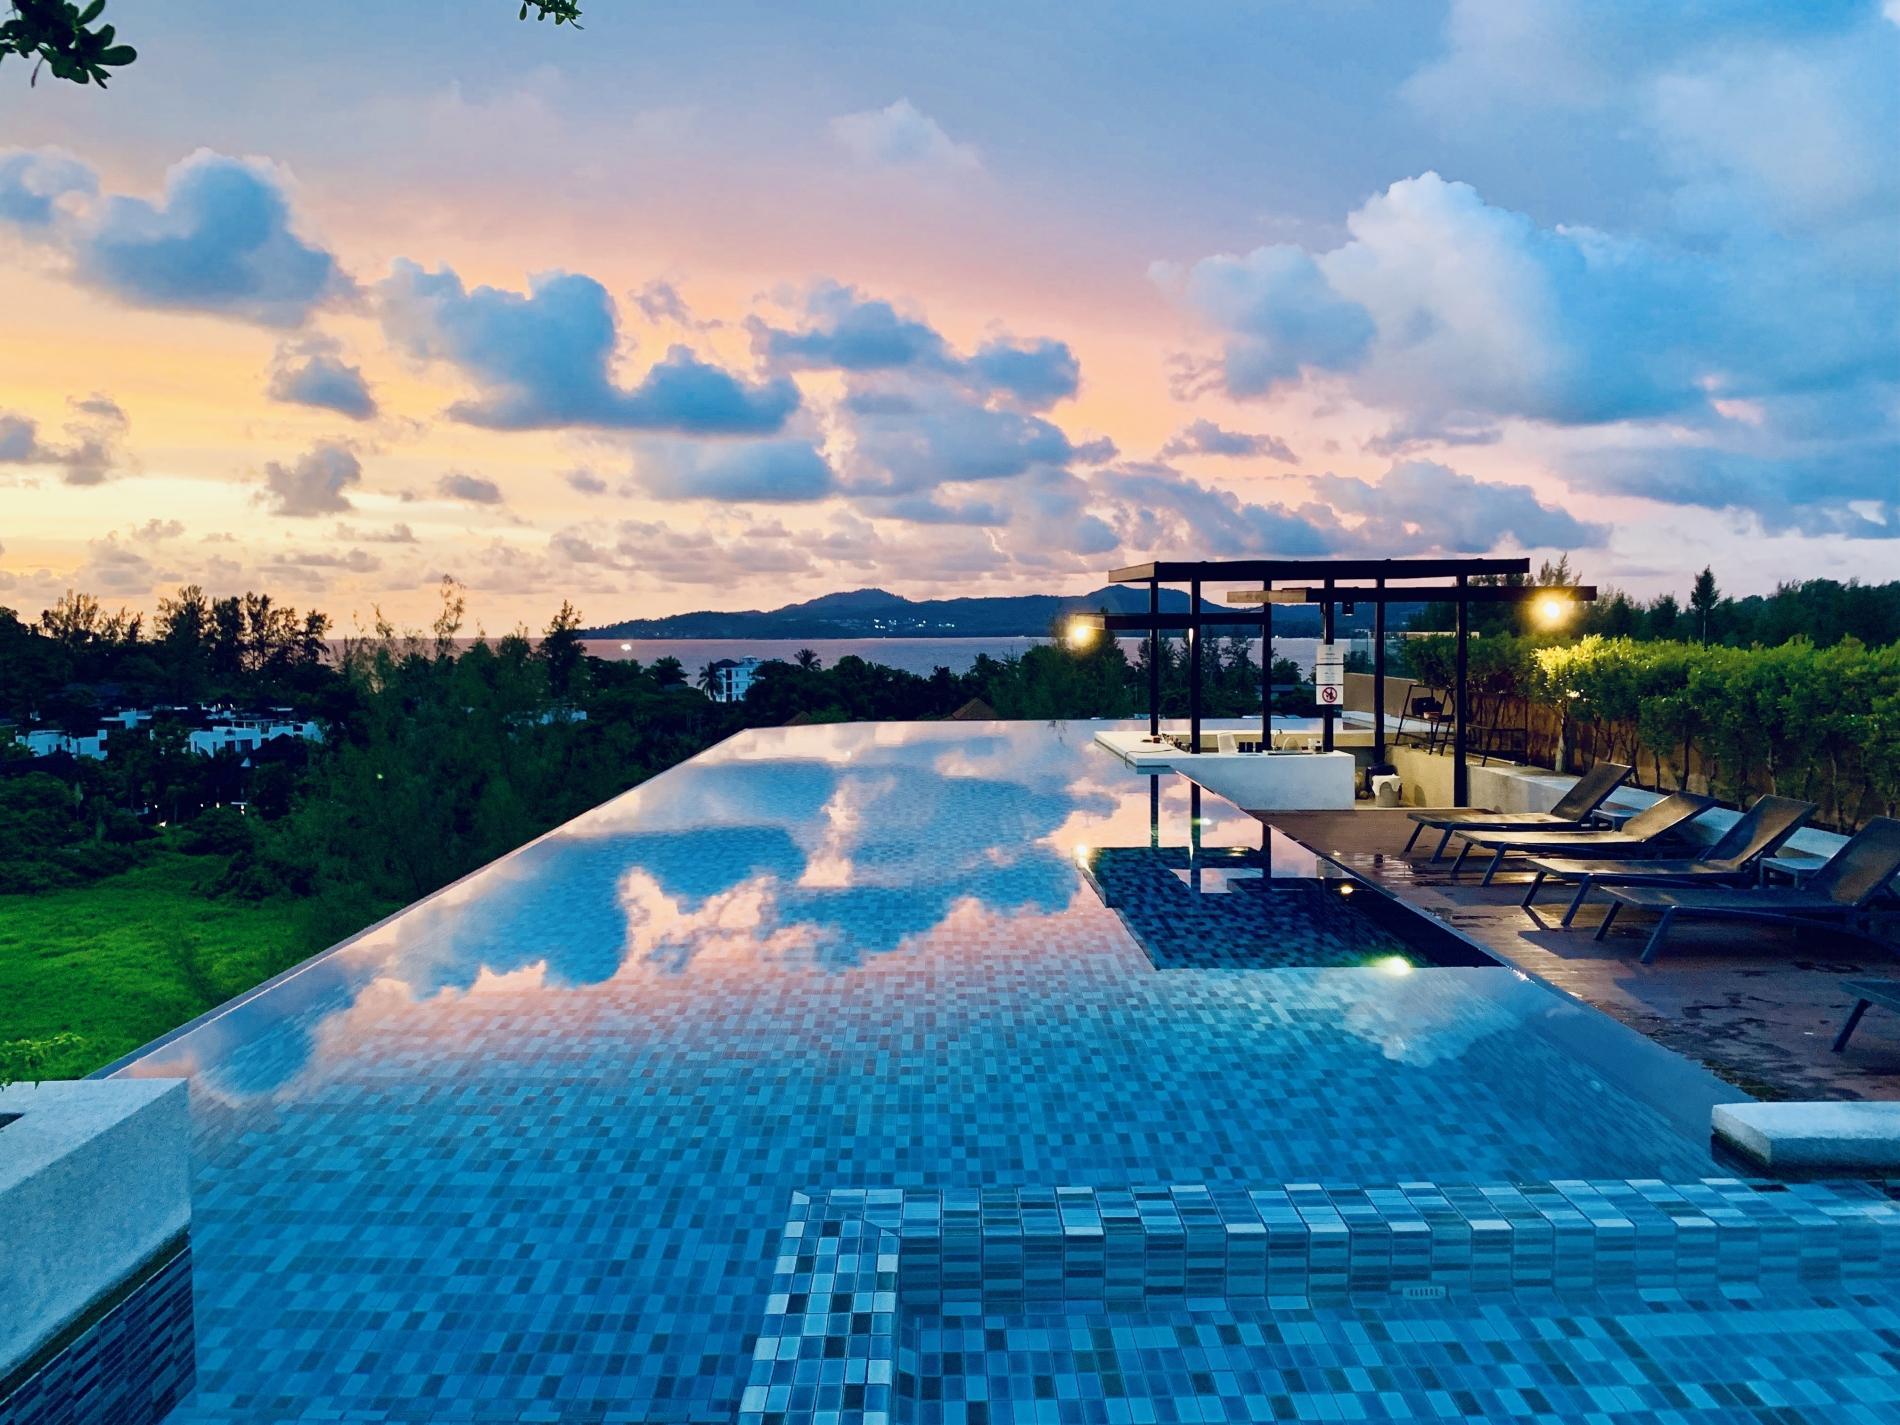 Apartment 6Av 218 - Surin beach studio  pool and gym photo 20395542